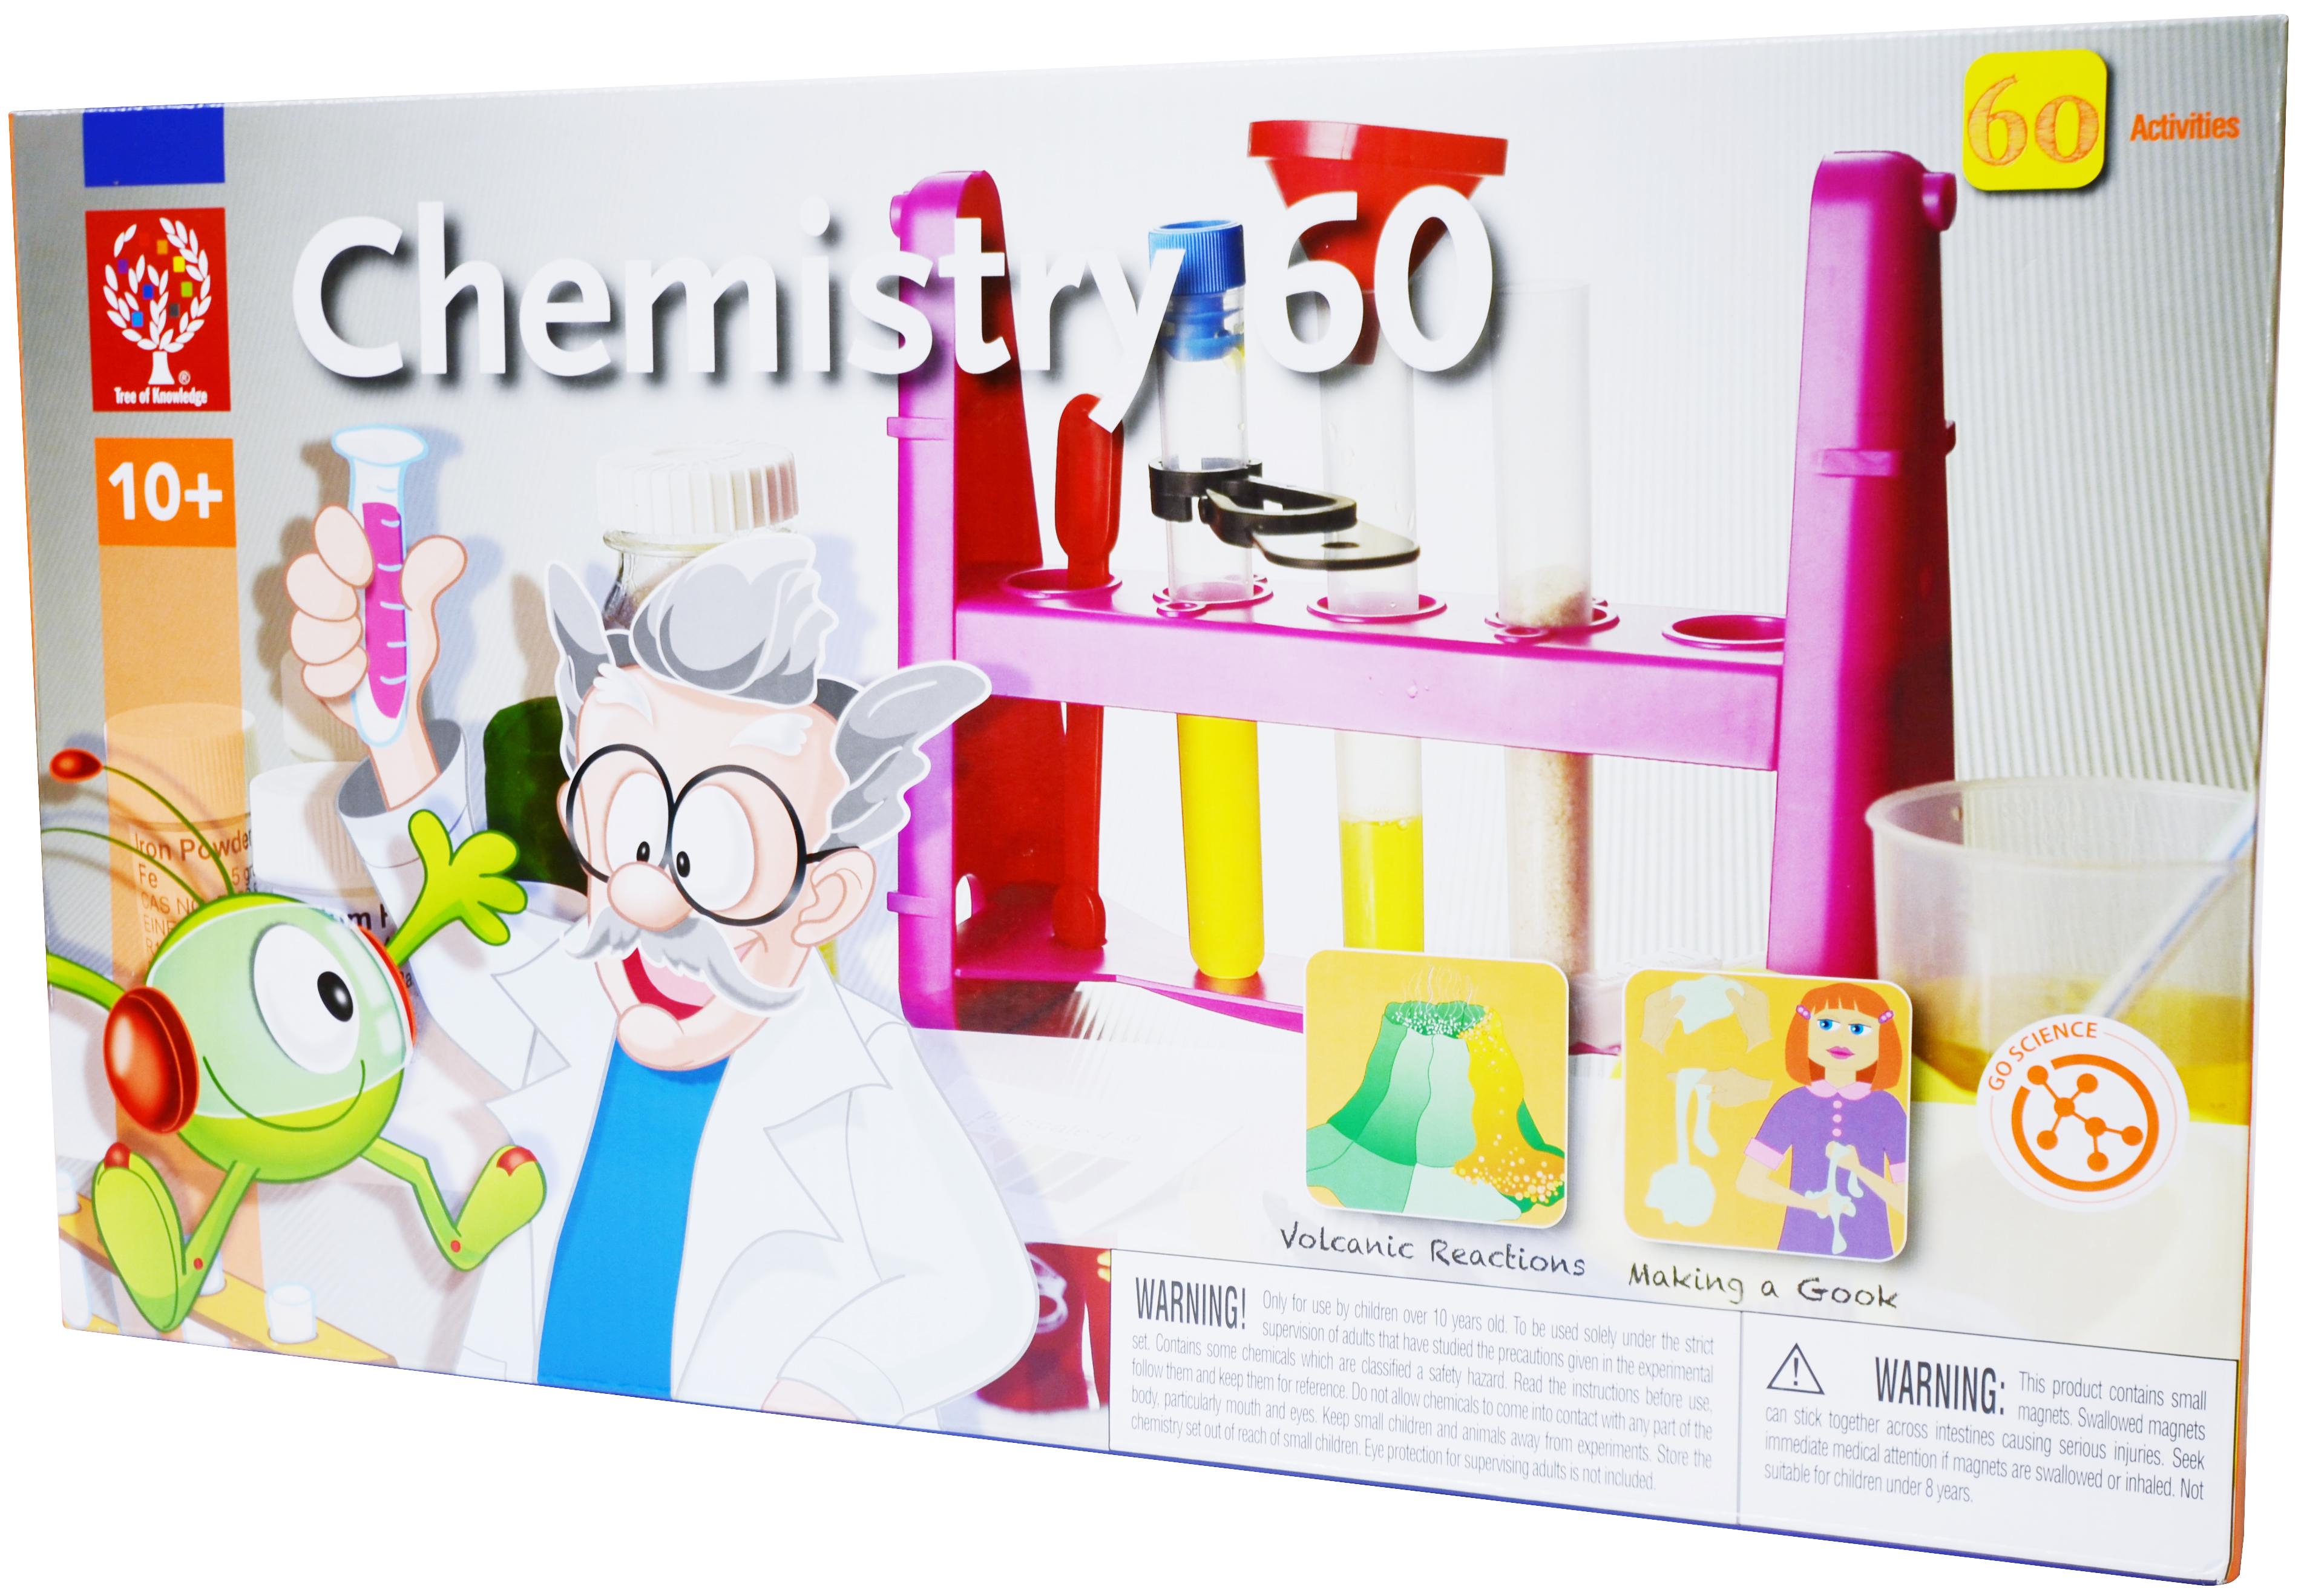 Educational Toys Kits Archives Elenco Snap Circuits Jr 100 Learning Center Planet Chem 60